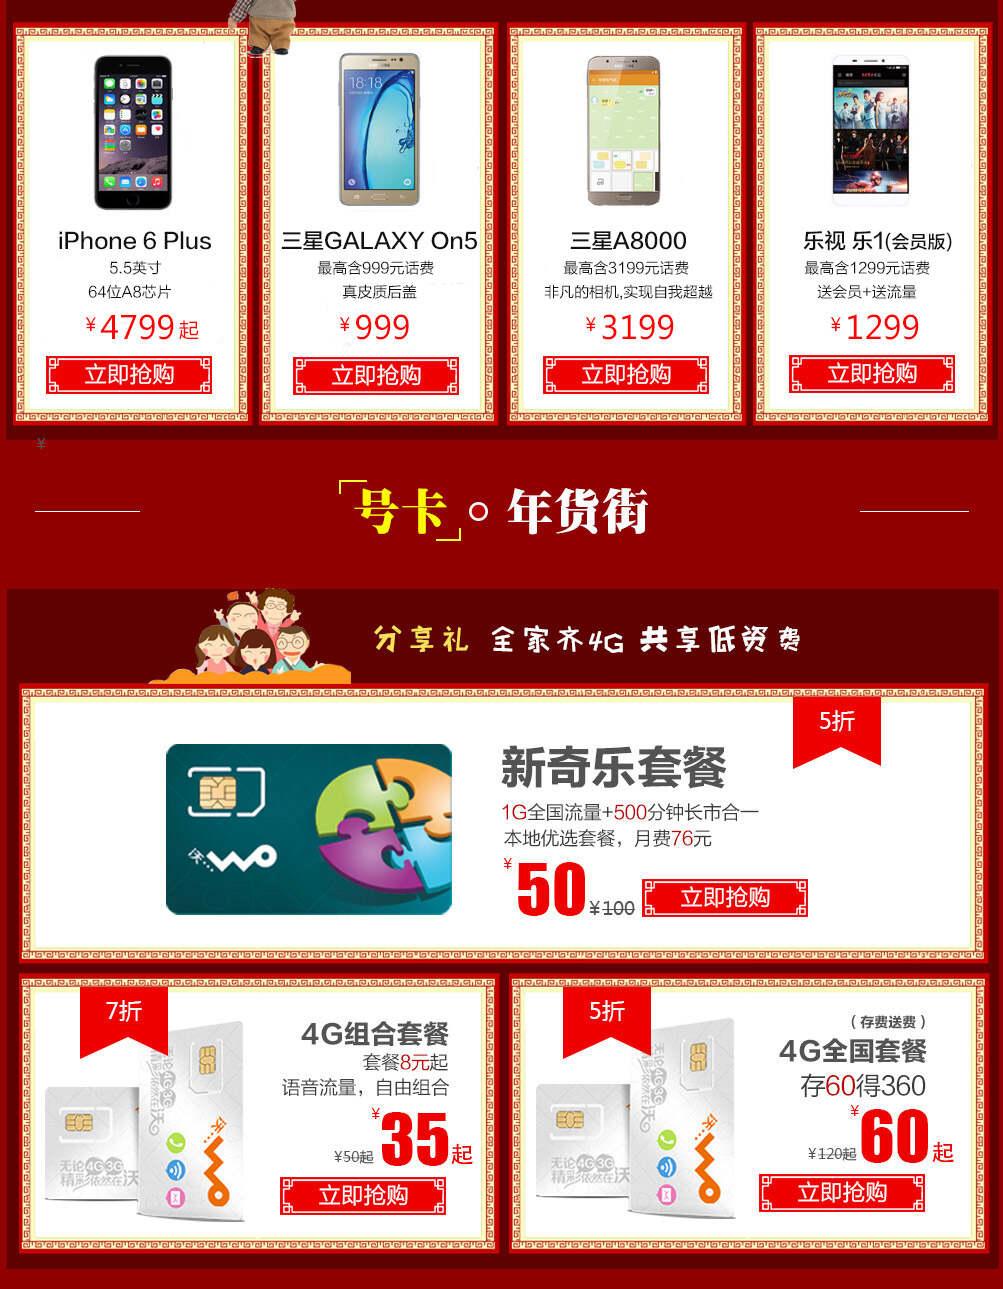 iPhone 6 新奇乐